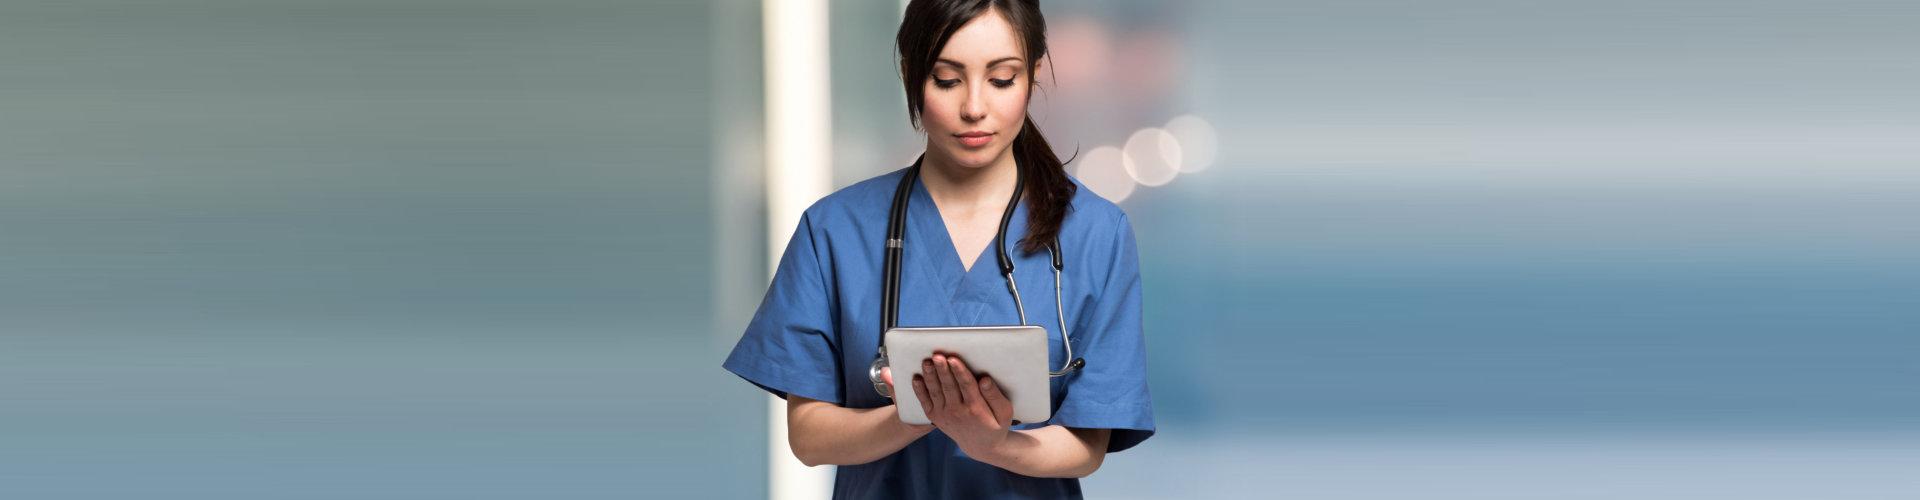 nurse using an ipad